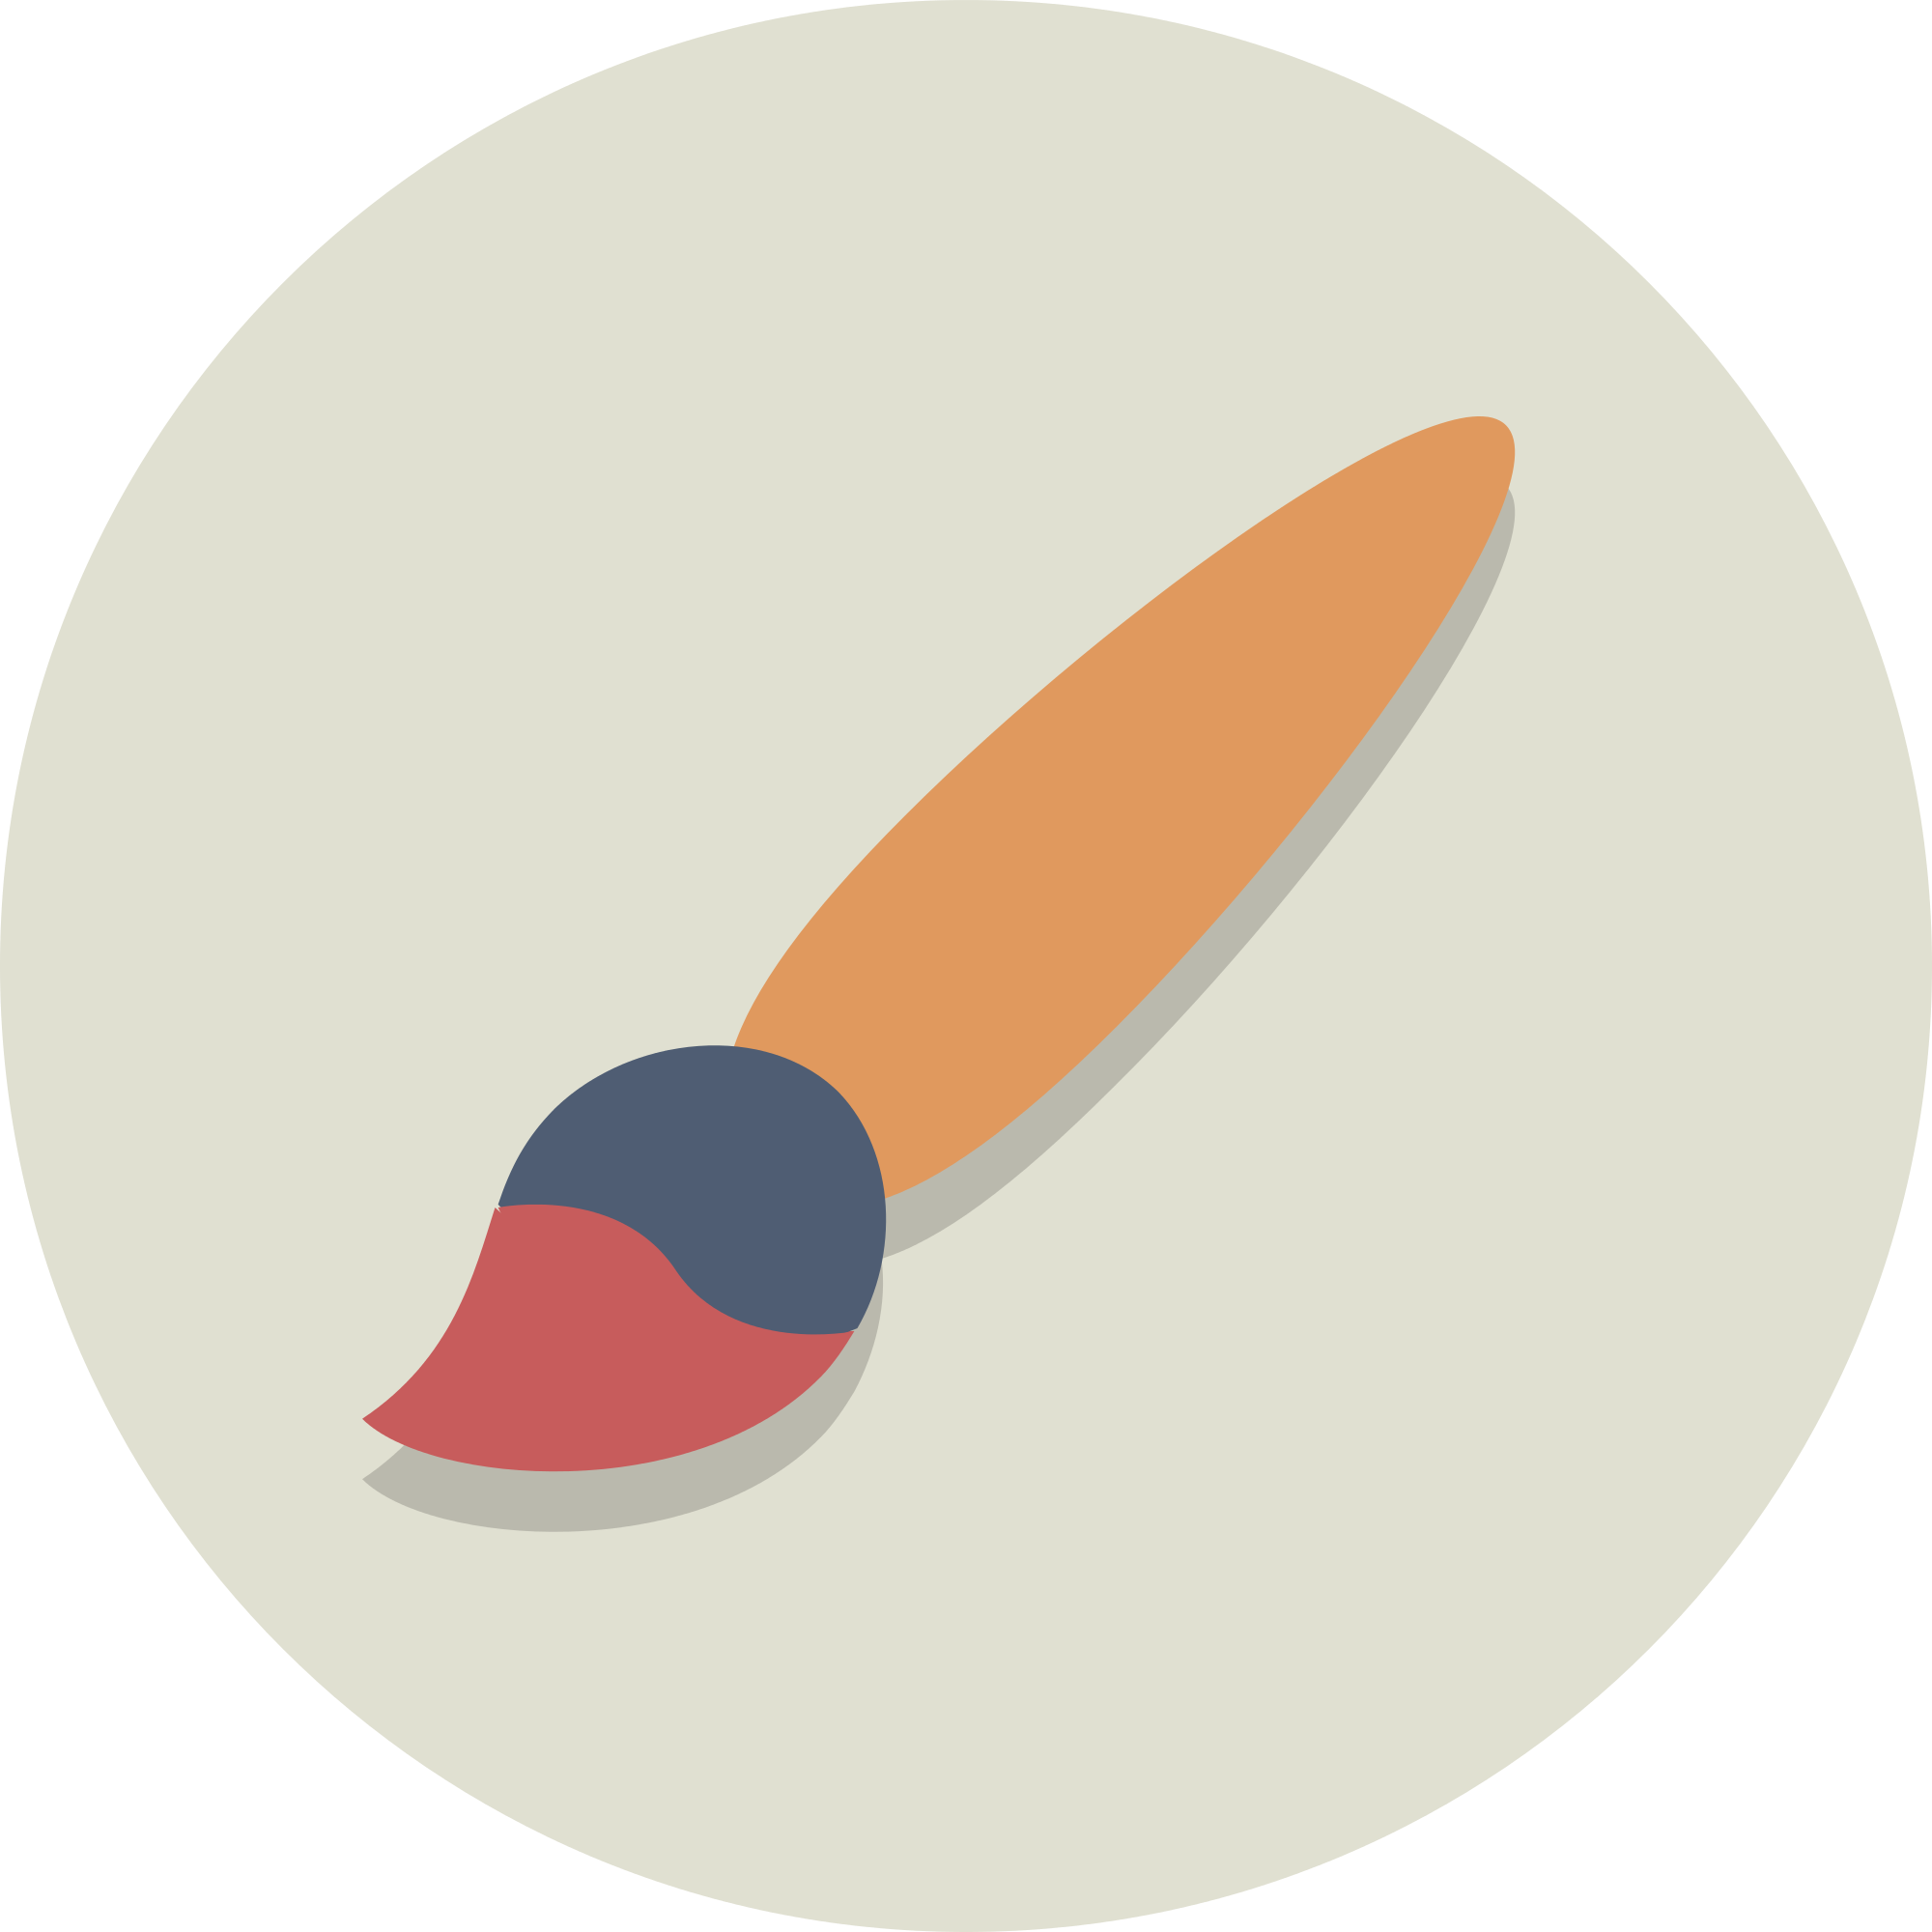 Paintbrush clipart svg. File circle icons wikimedia